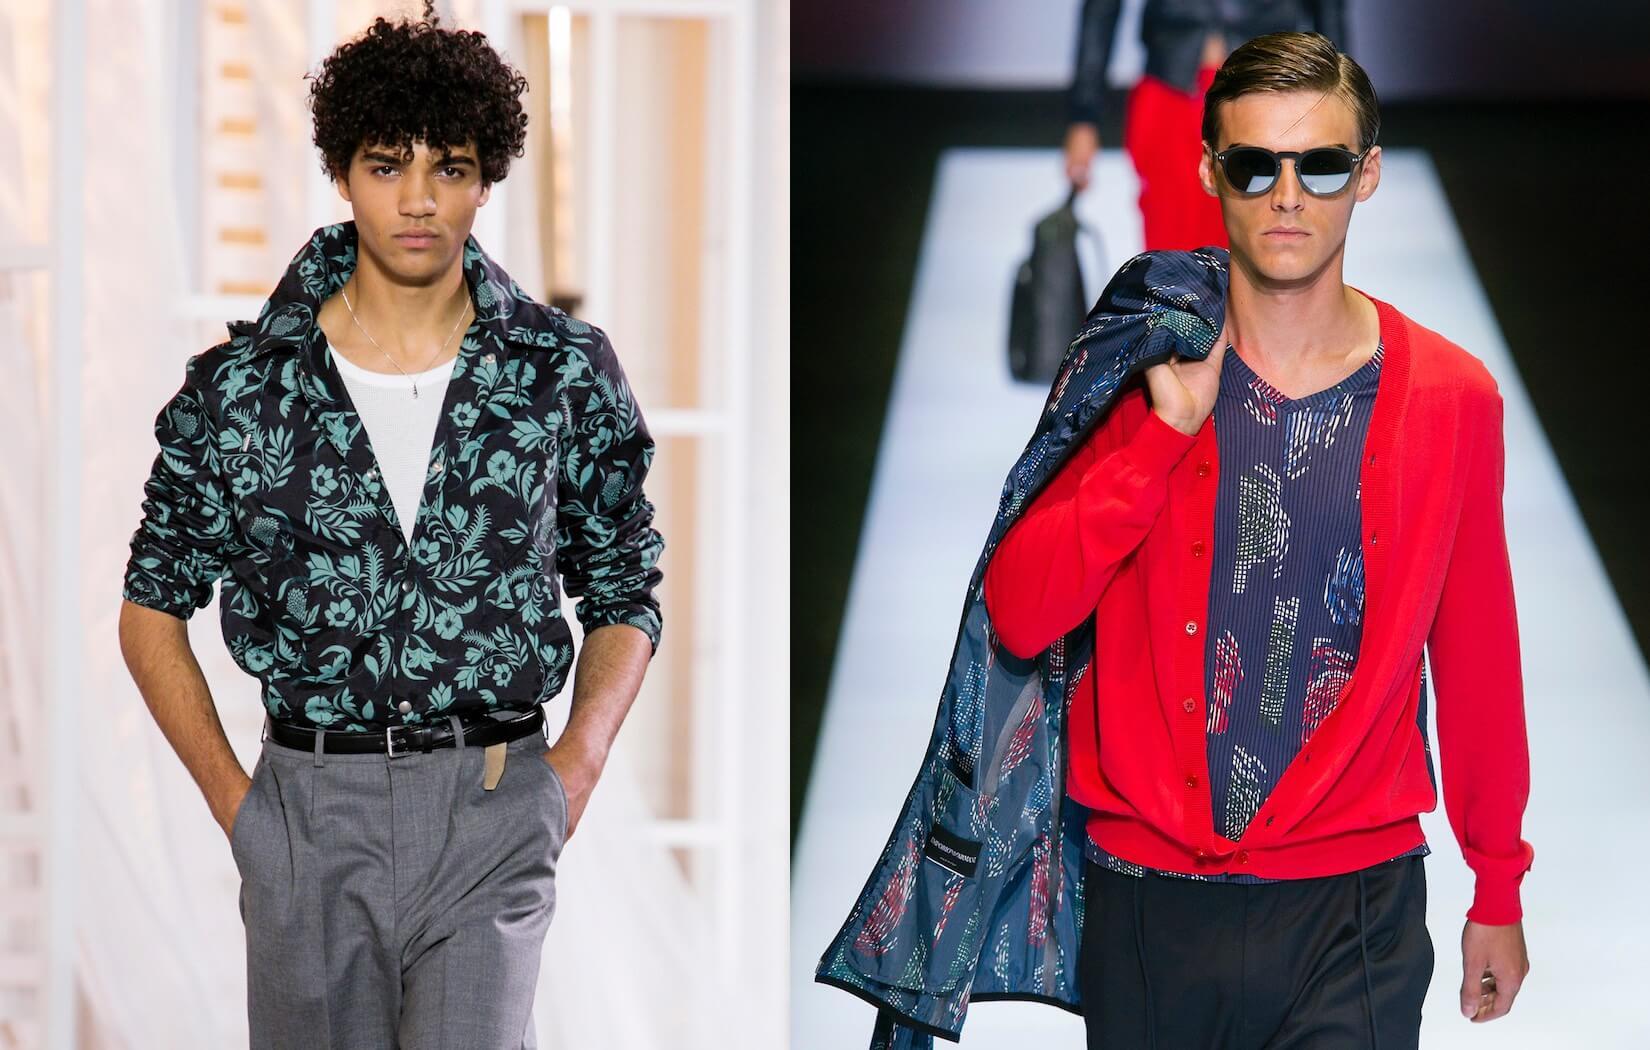 Uomo: bonton, skin, afro le tre tendenze base 2017